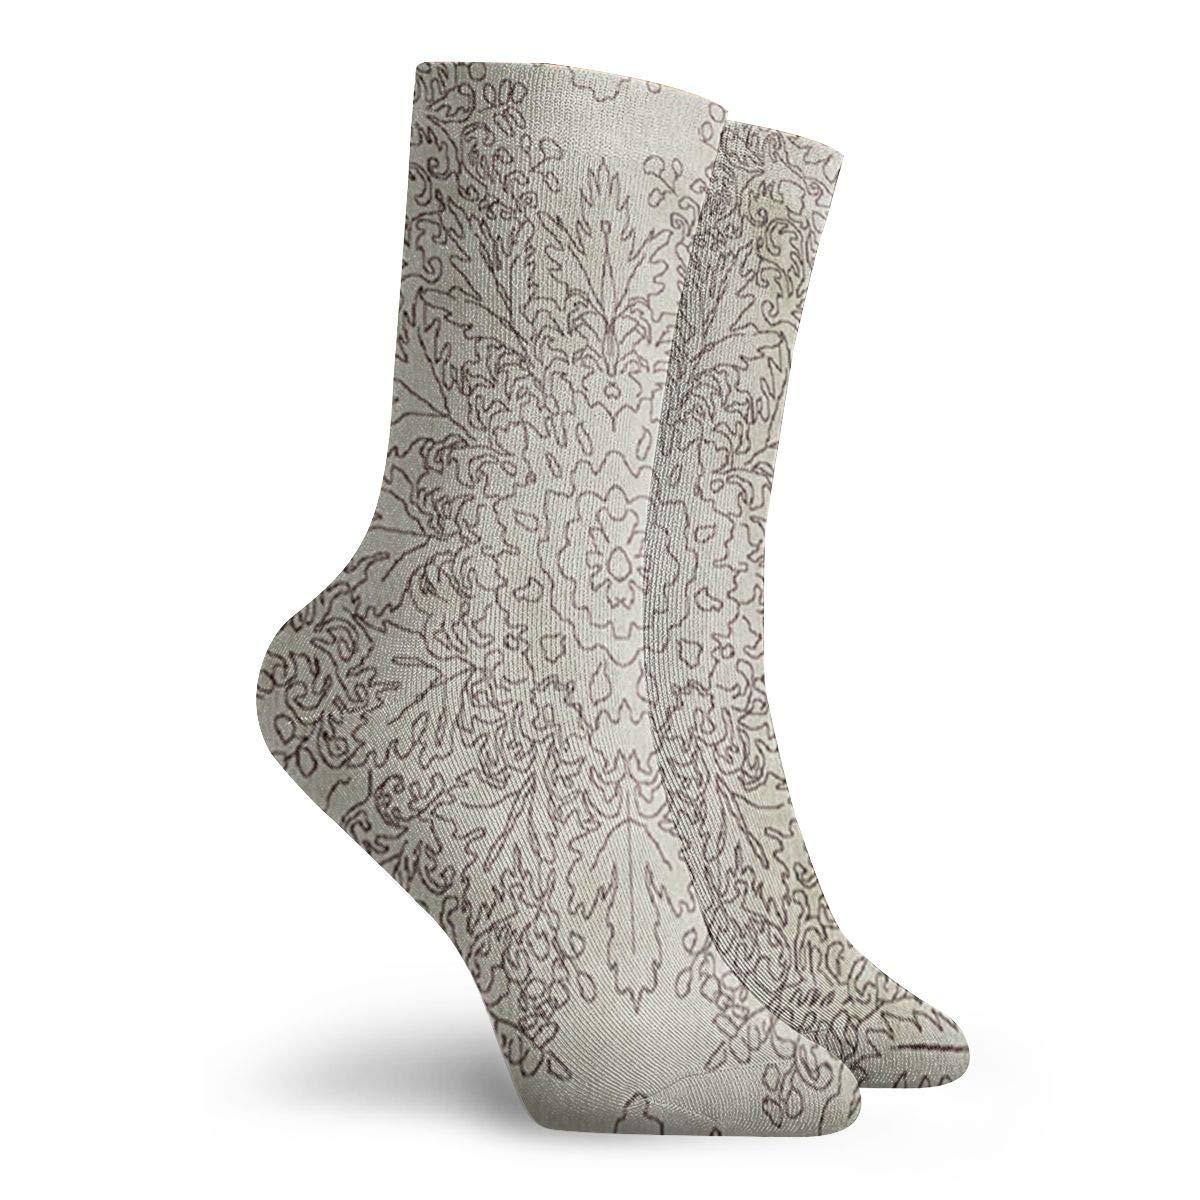 LivingDivani Unisex Funny Casual Crew Socks Athletic Socks For Boys Girls Kids Teenagers